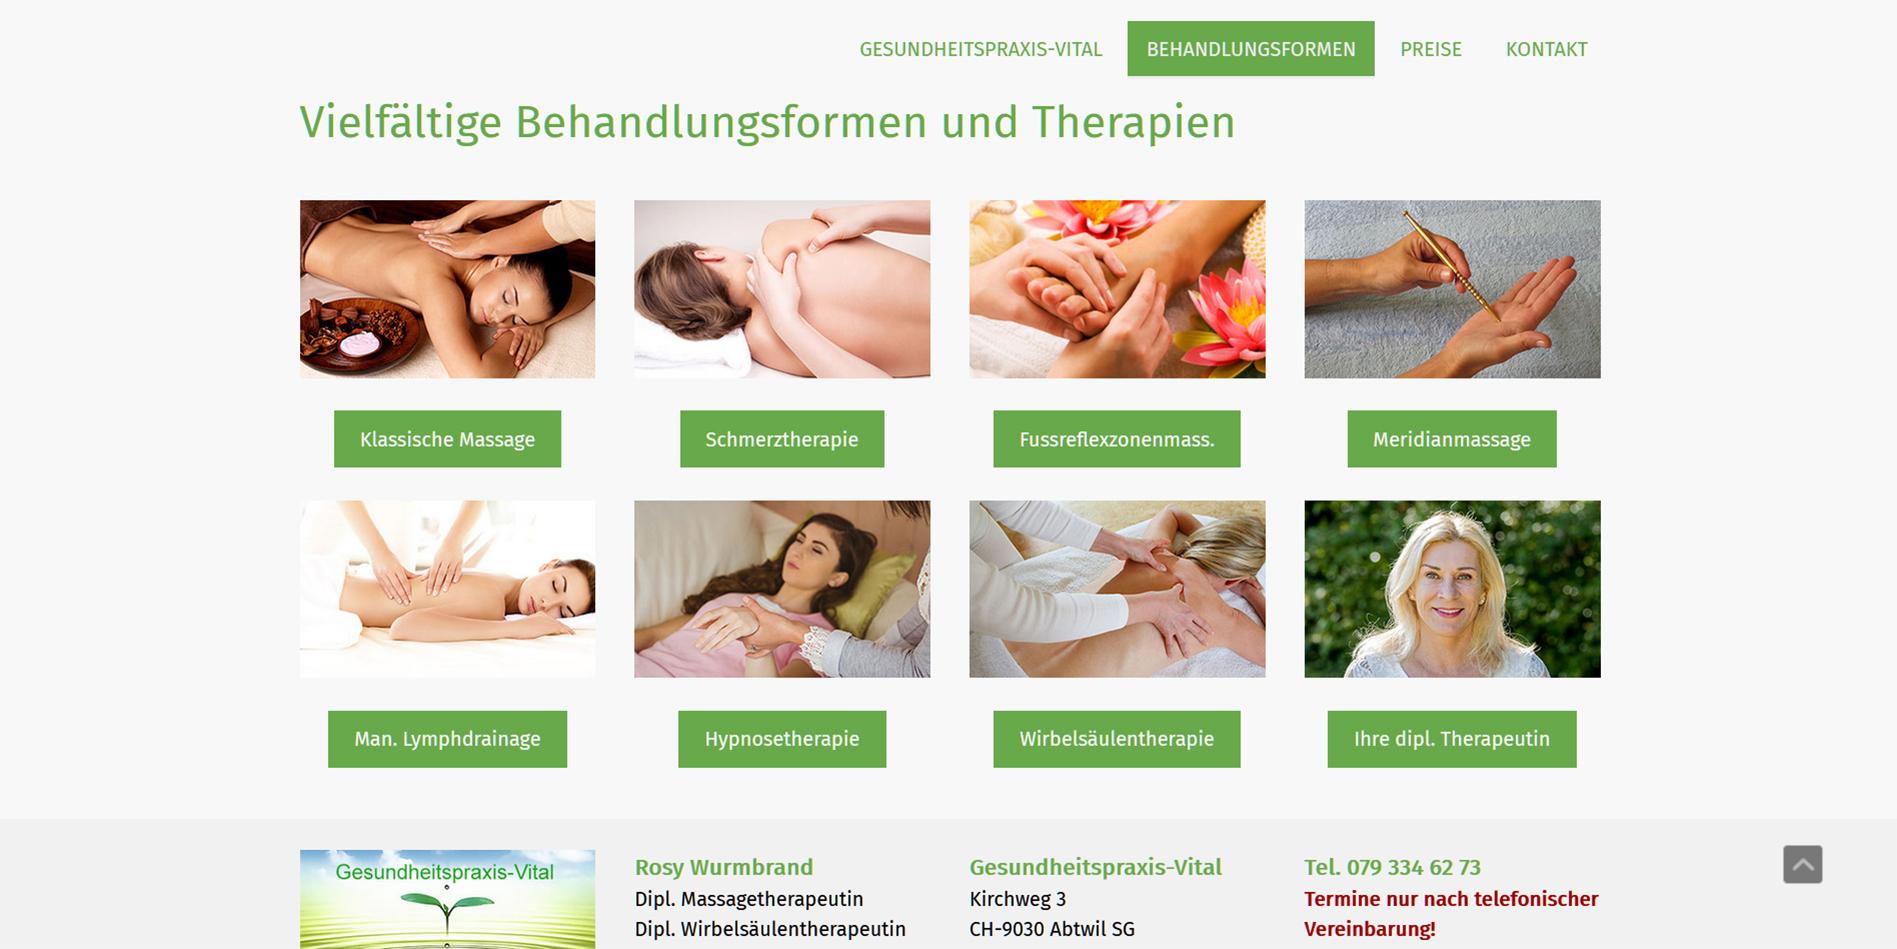 Website Gesundheitspraxis Vital Abtwil SG